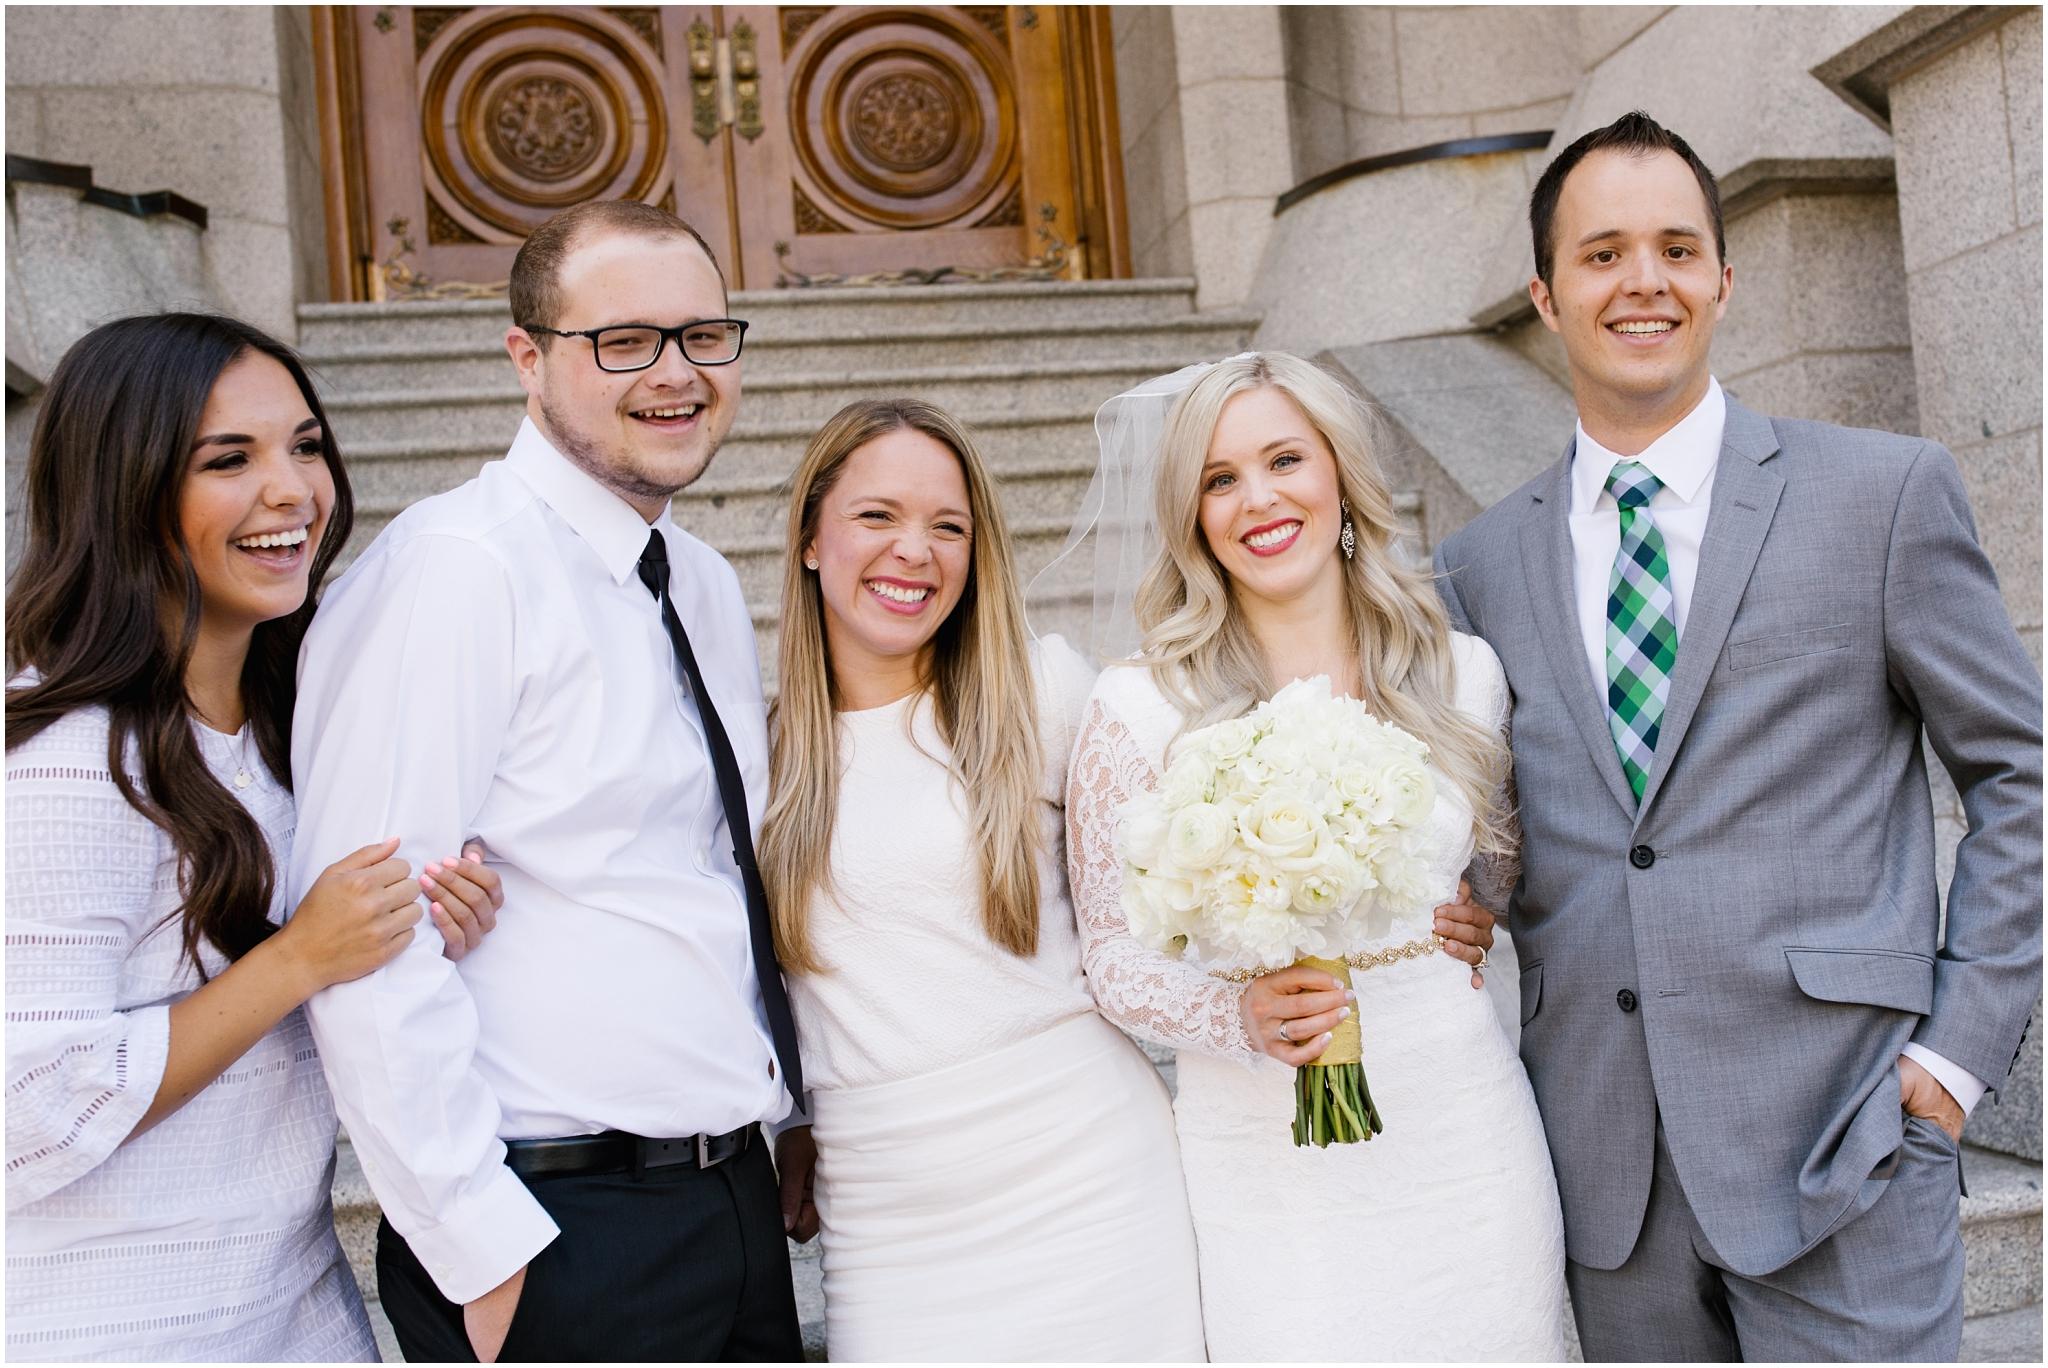 CherylandTyler-81_Lizzie-B-Imagery-Utah-Wedding-Photographer-Salt-Lake-City-Temple-Wells-Fargo-Building-Reception.jpg